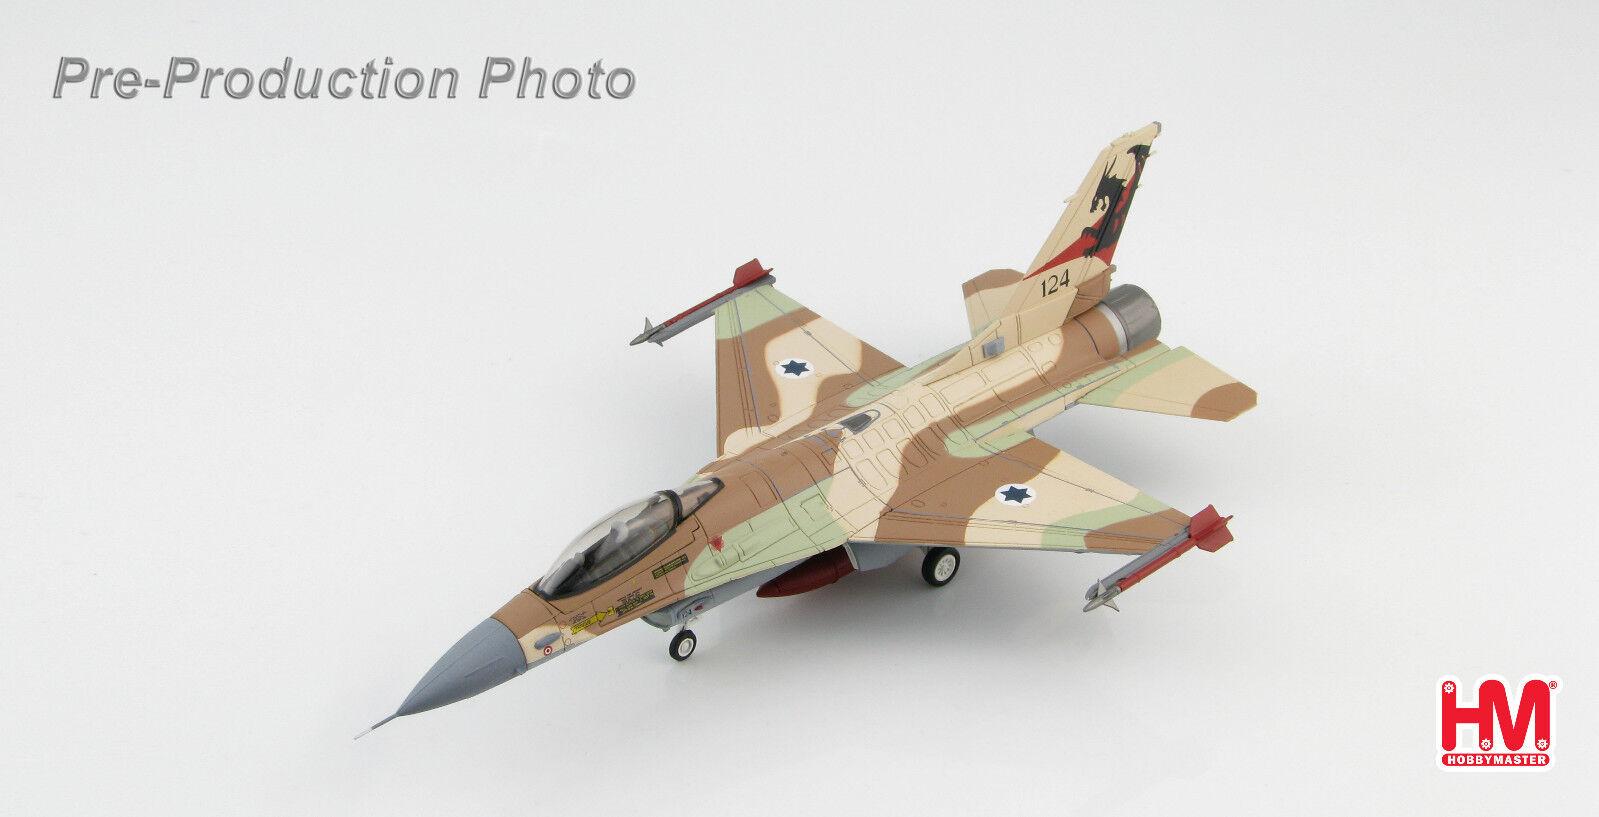 Hobby - meister ha3825 1   72 general dynamics f-16a   netz no.124, tayaset 1